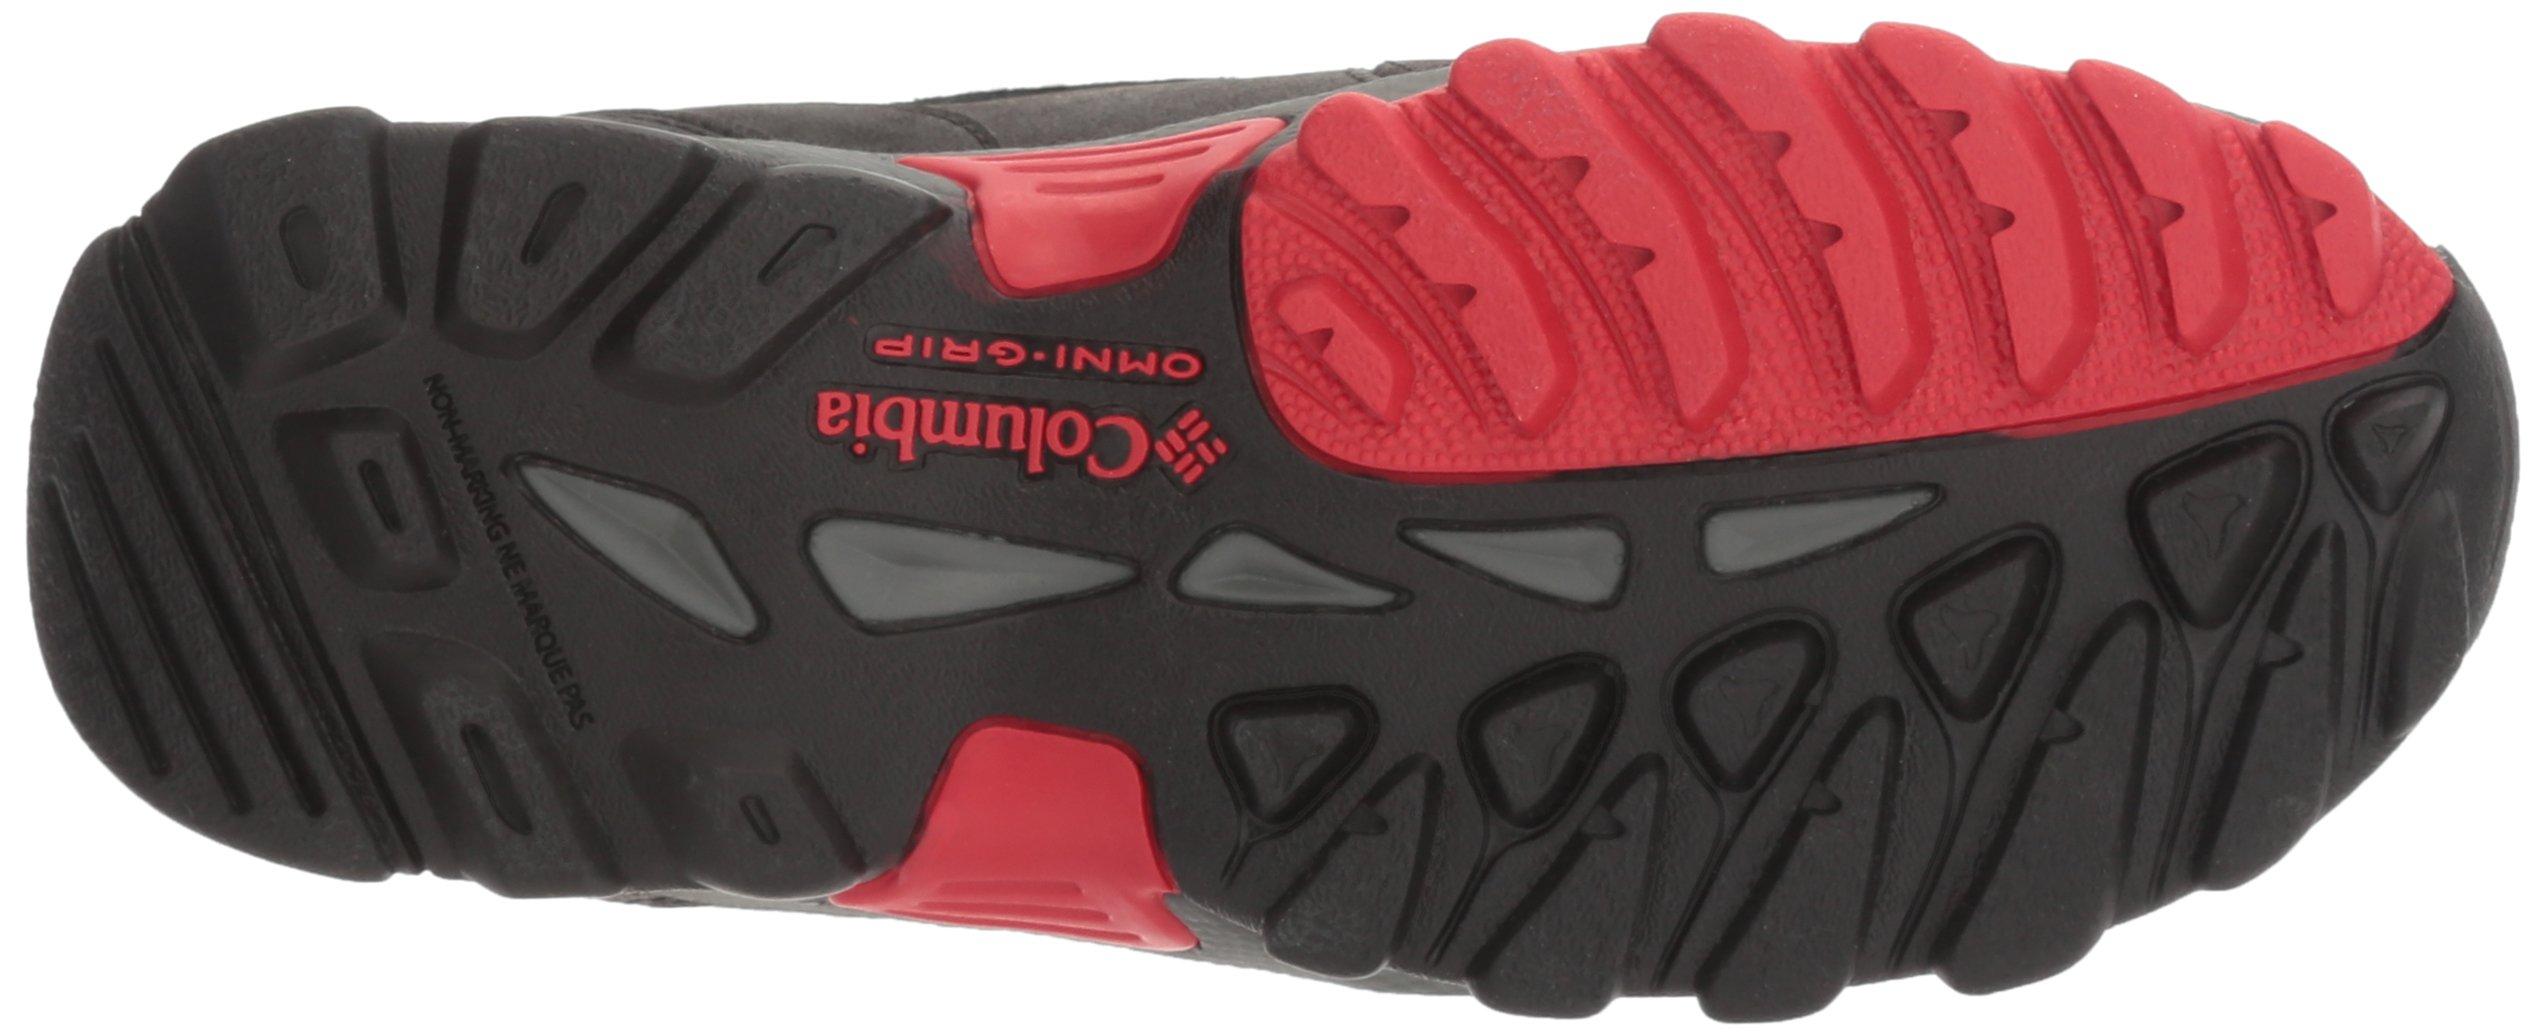 Columbia Kids  Youth Newton Ridge Hiking Boot   Hiking Shoes   Clothing ed51306904